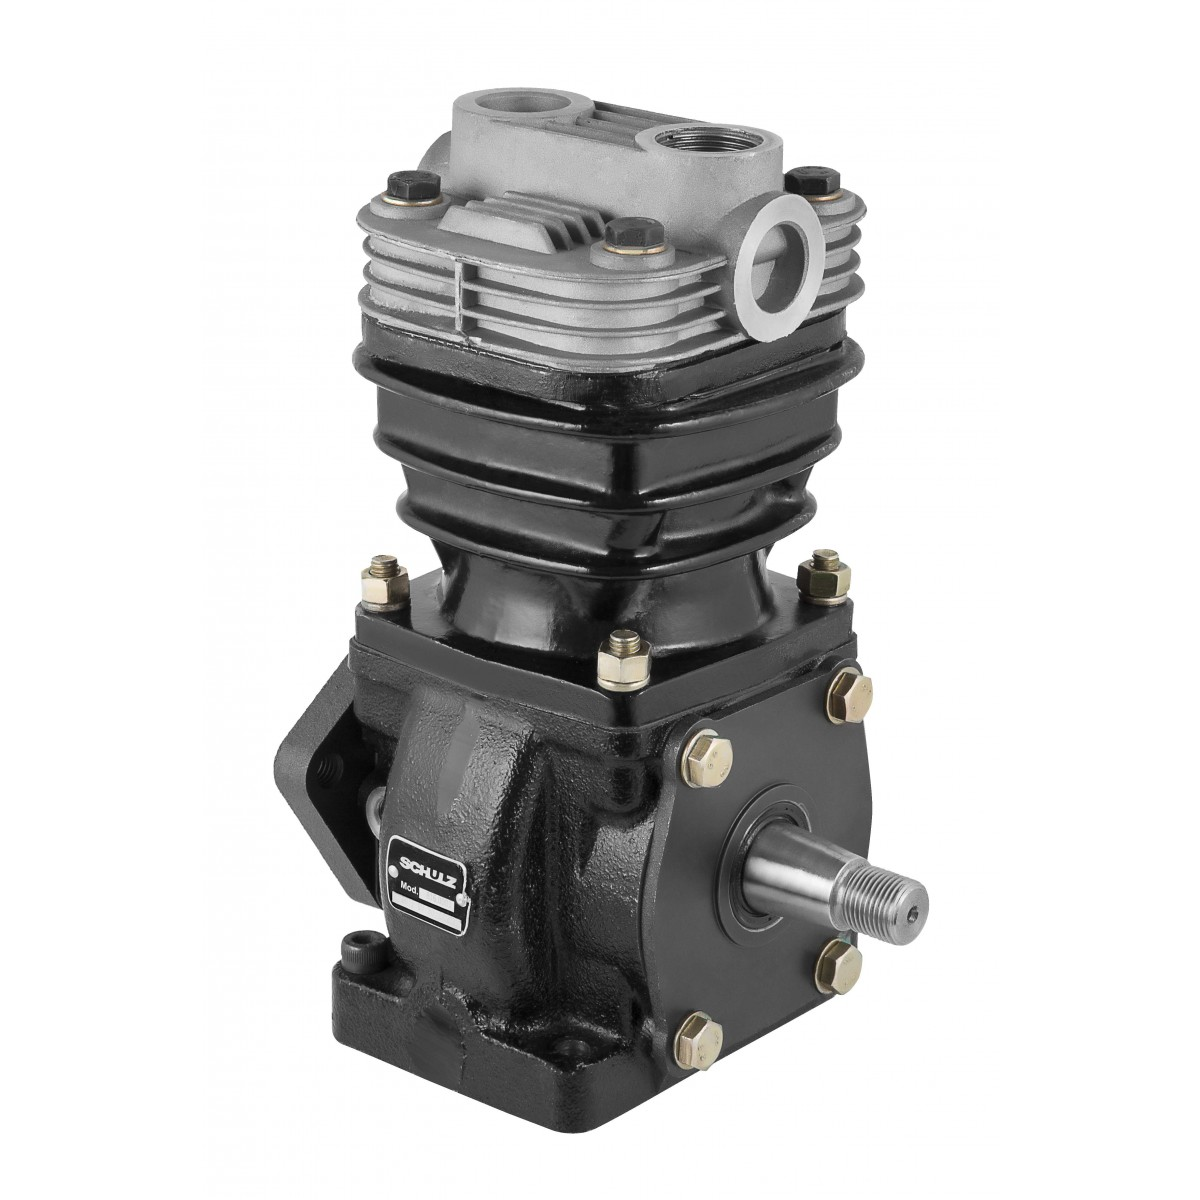 Compressor de ar monocilindro OM366 Mercedes Benz / Volkswagem